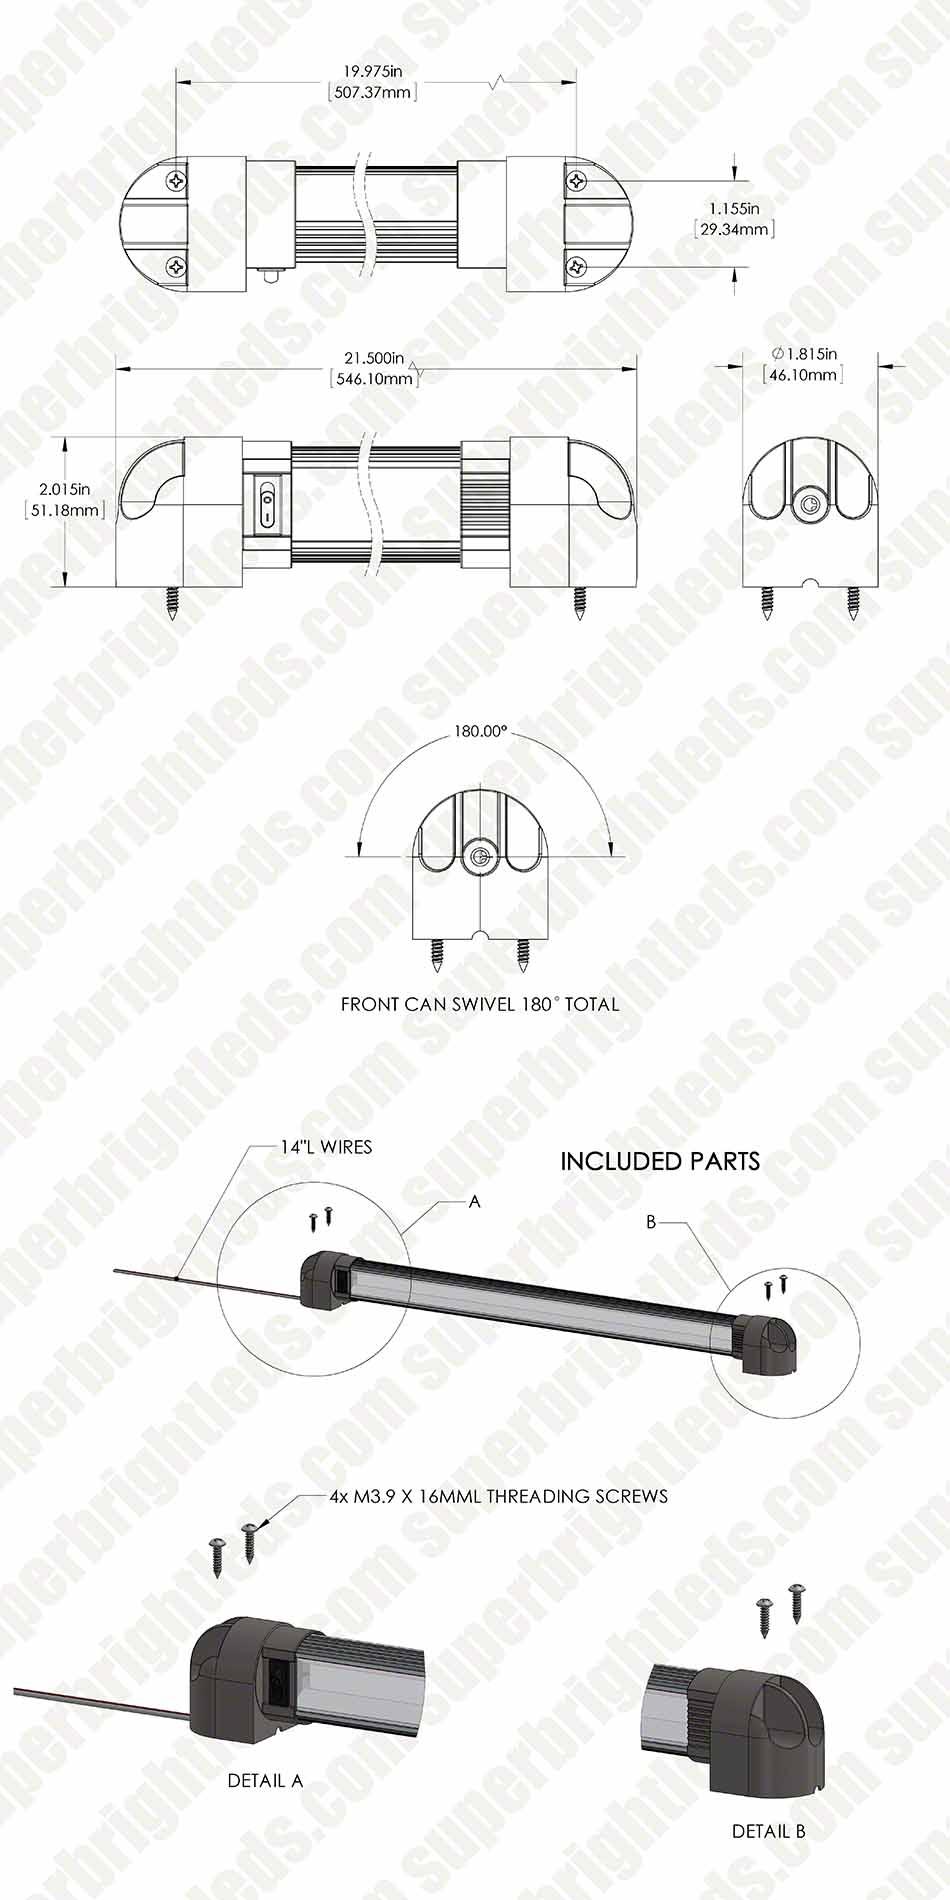 21 1 2 Heavy Duty Swivel Led Utility Light Bar W 12 Leds And Wiring Diagram Mini Rocker 215 With Switch